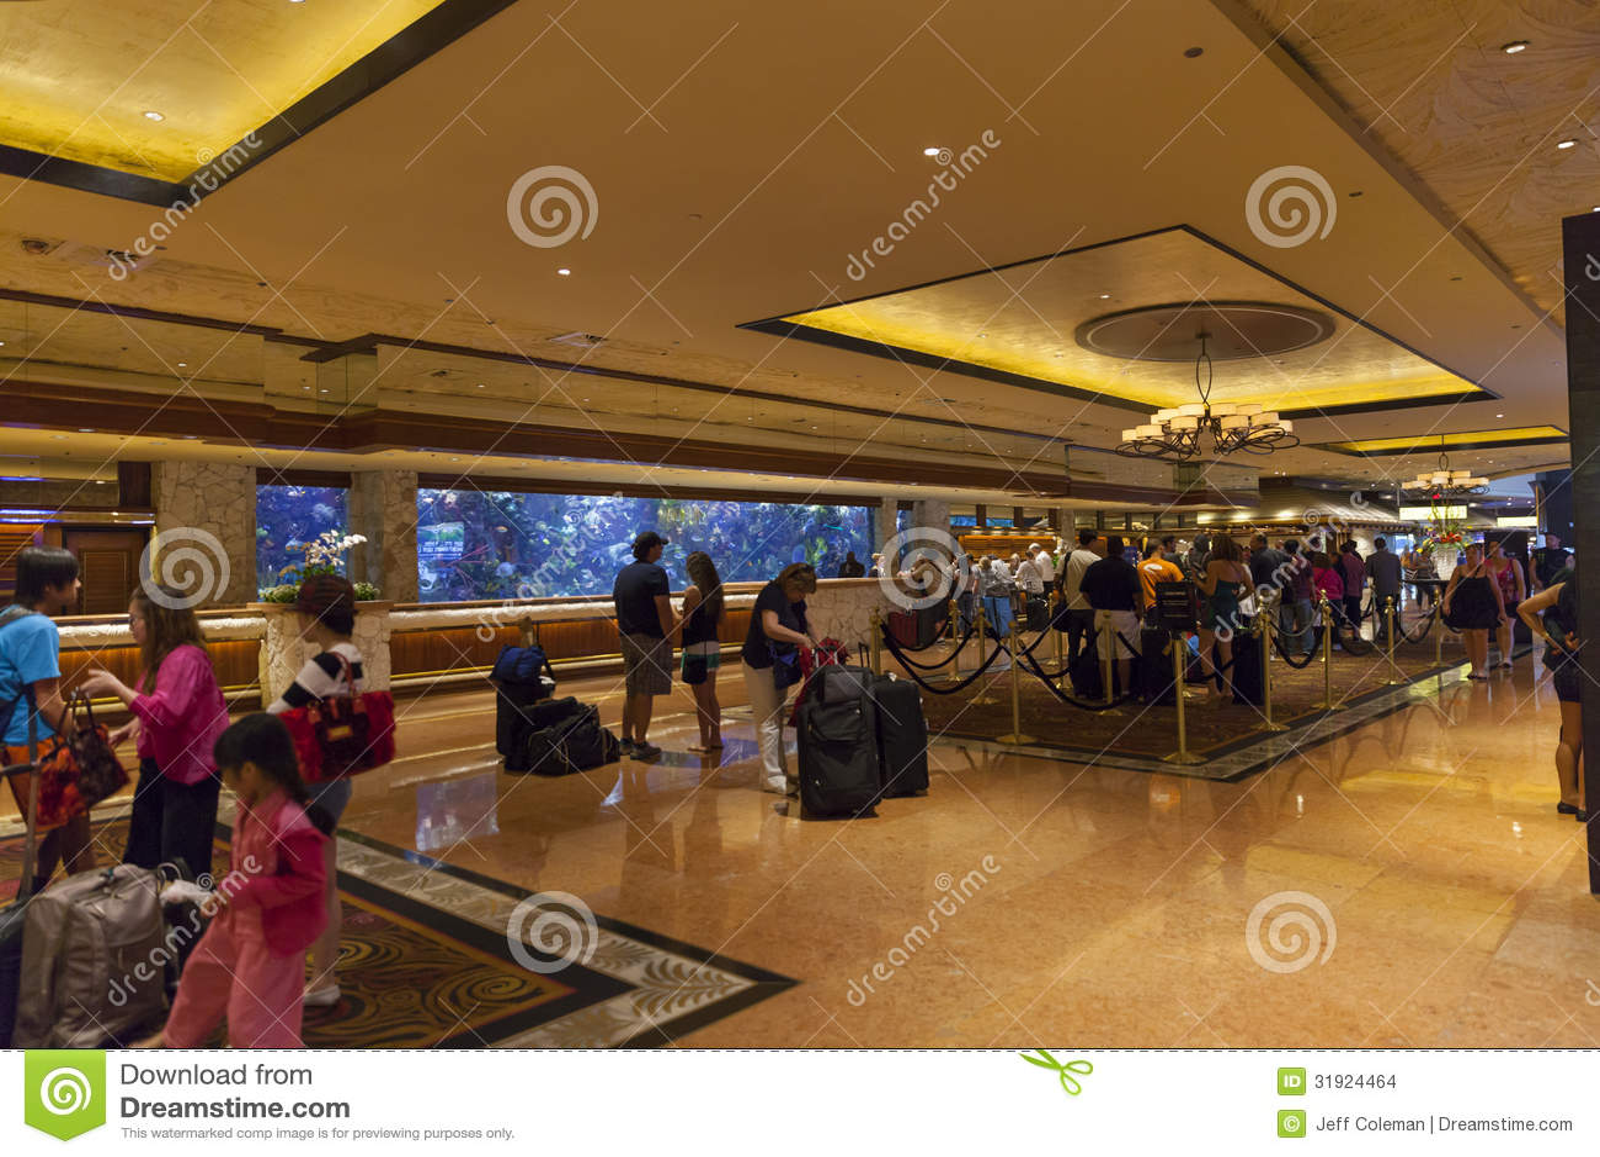 Mirage Hotel Lobby In Las Vegas Nv On June 26 2013